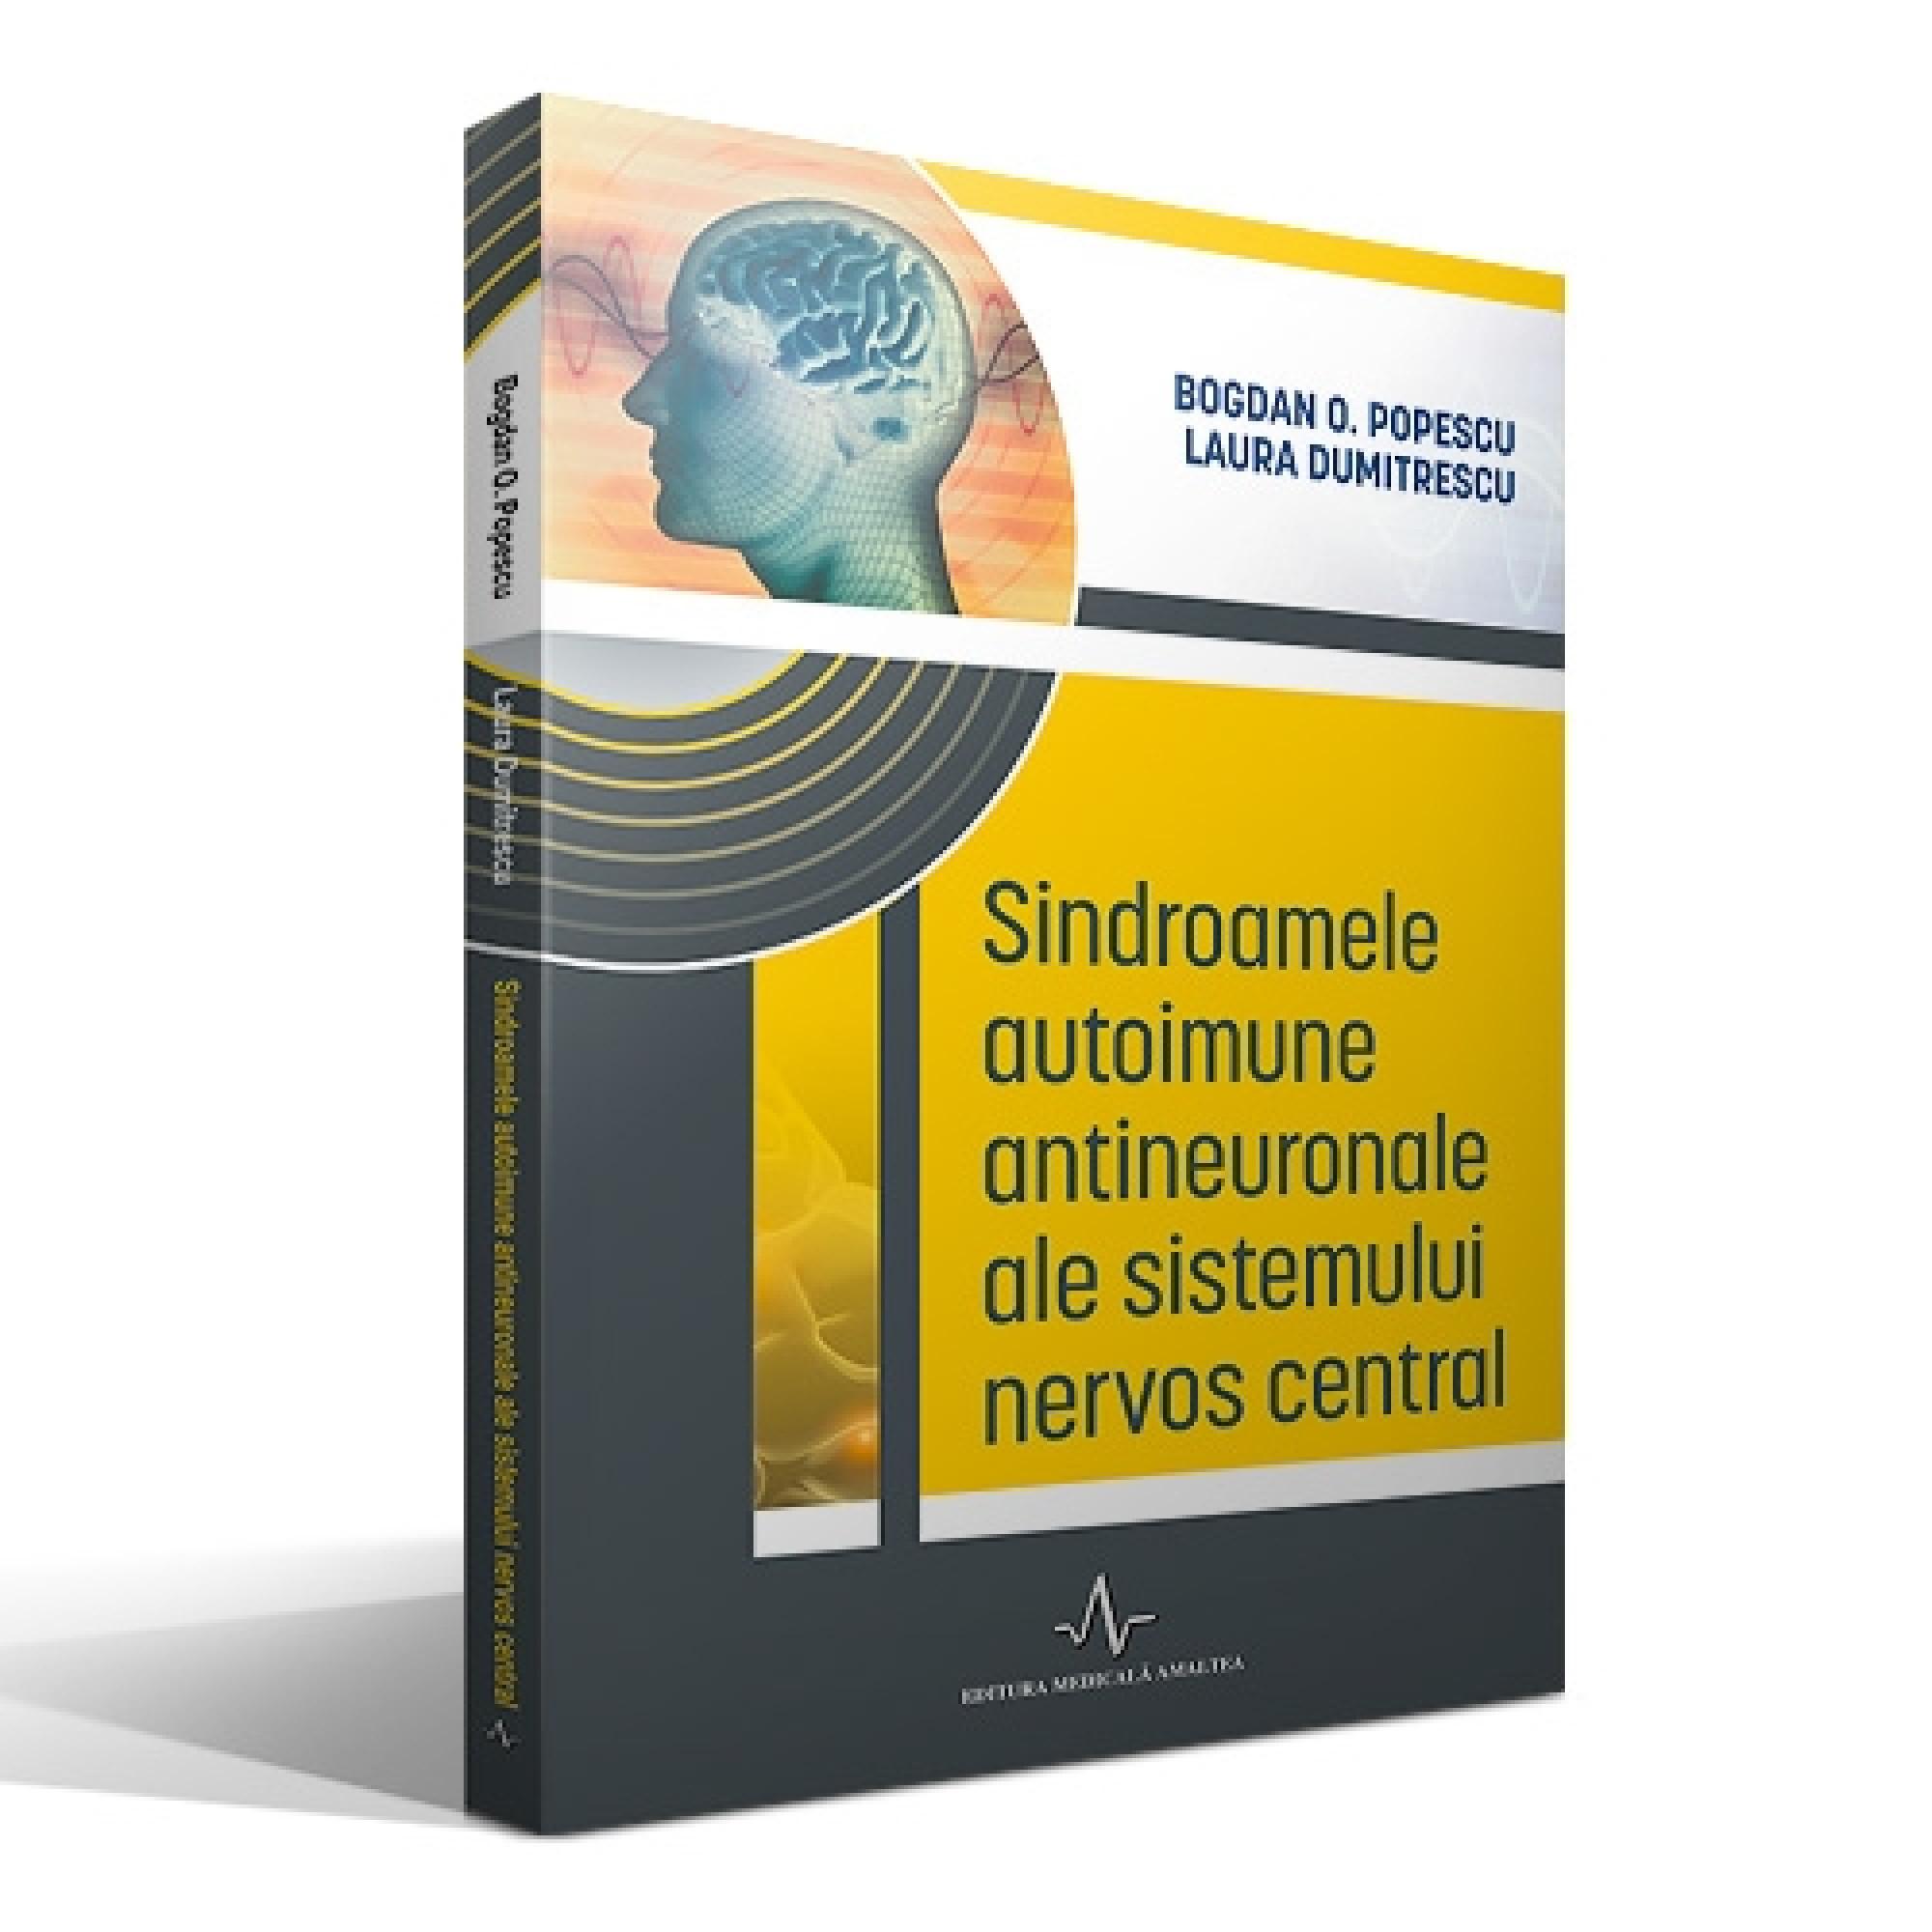 Sindroamele autoimune antineuronale ale sistemului nervos central